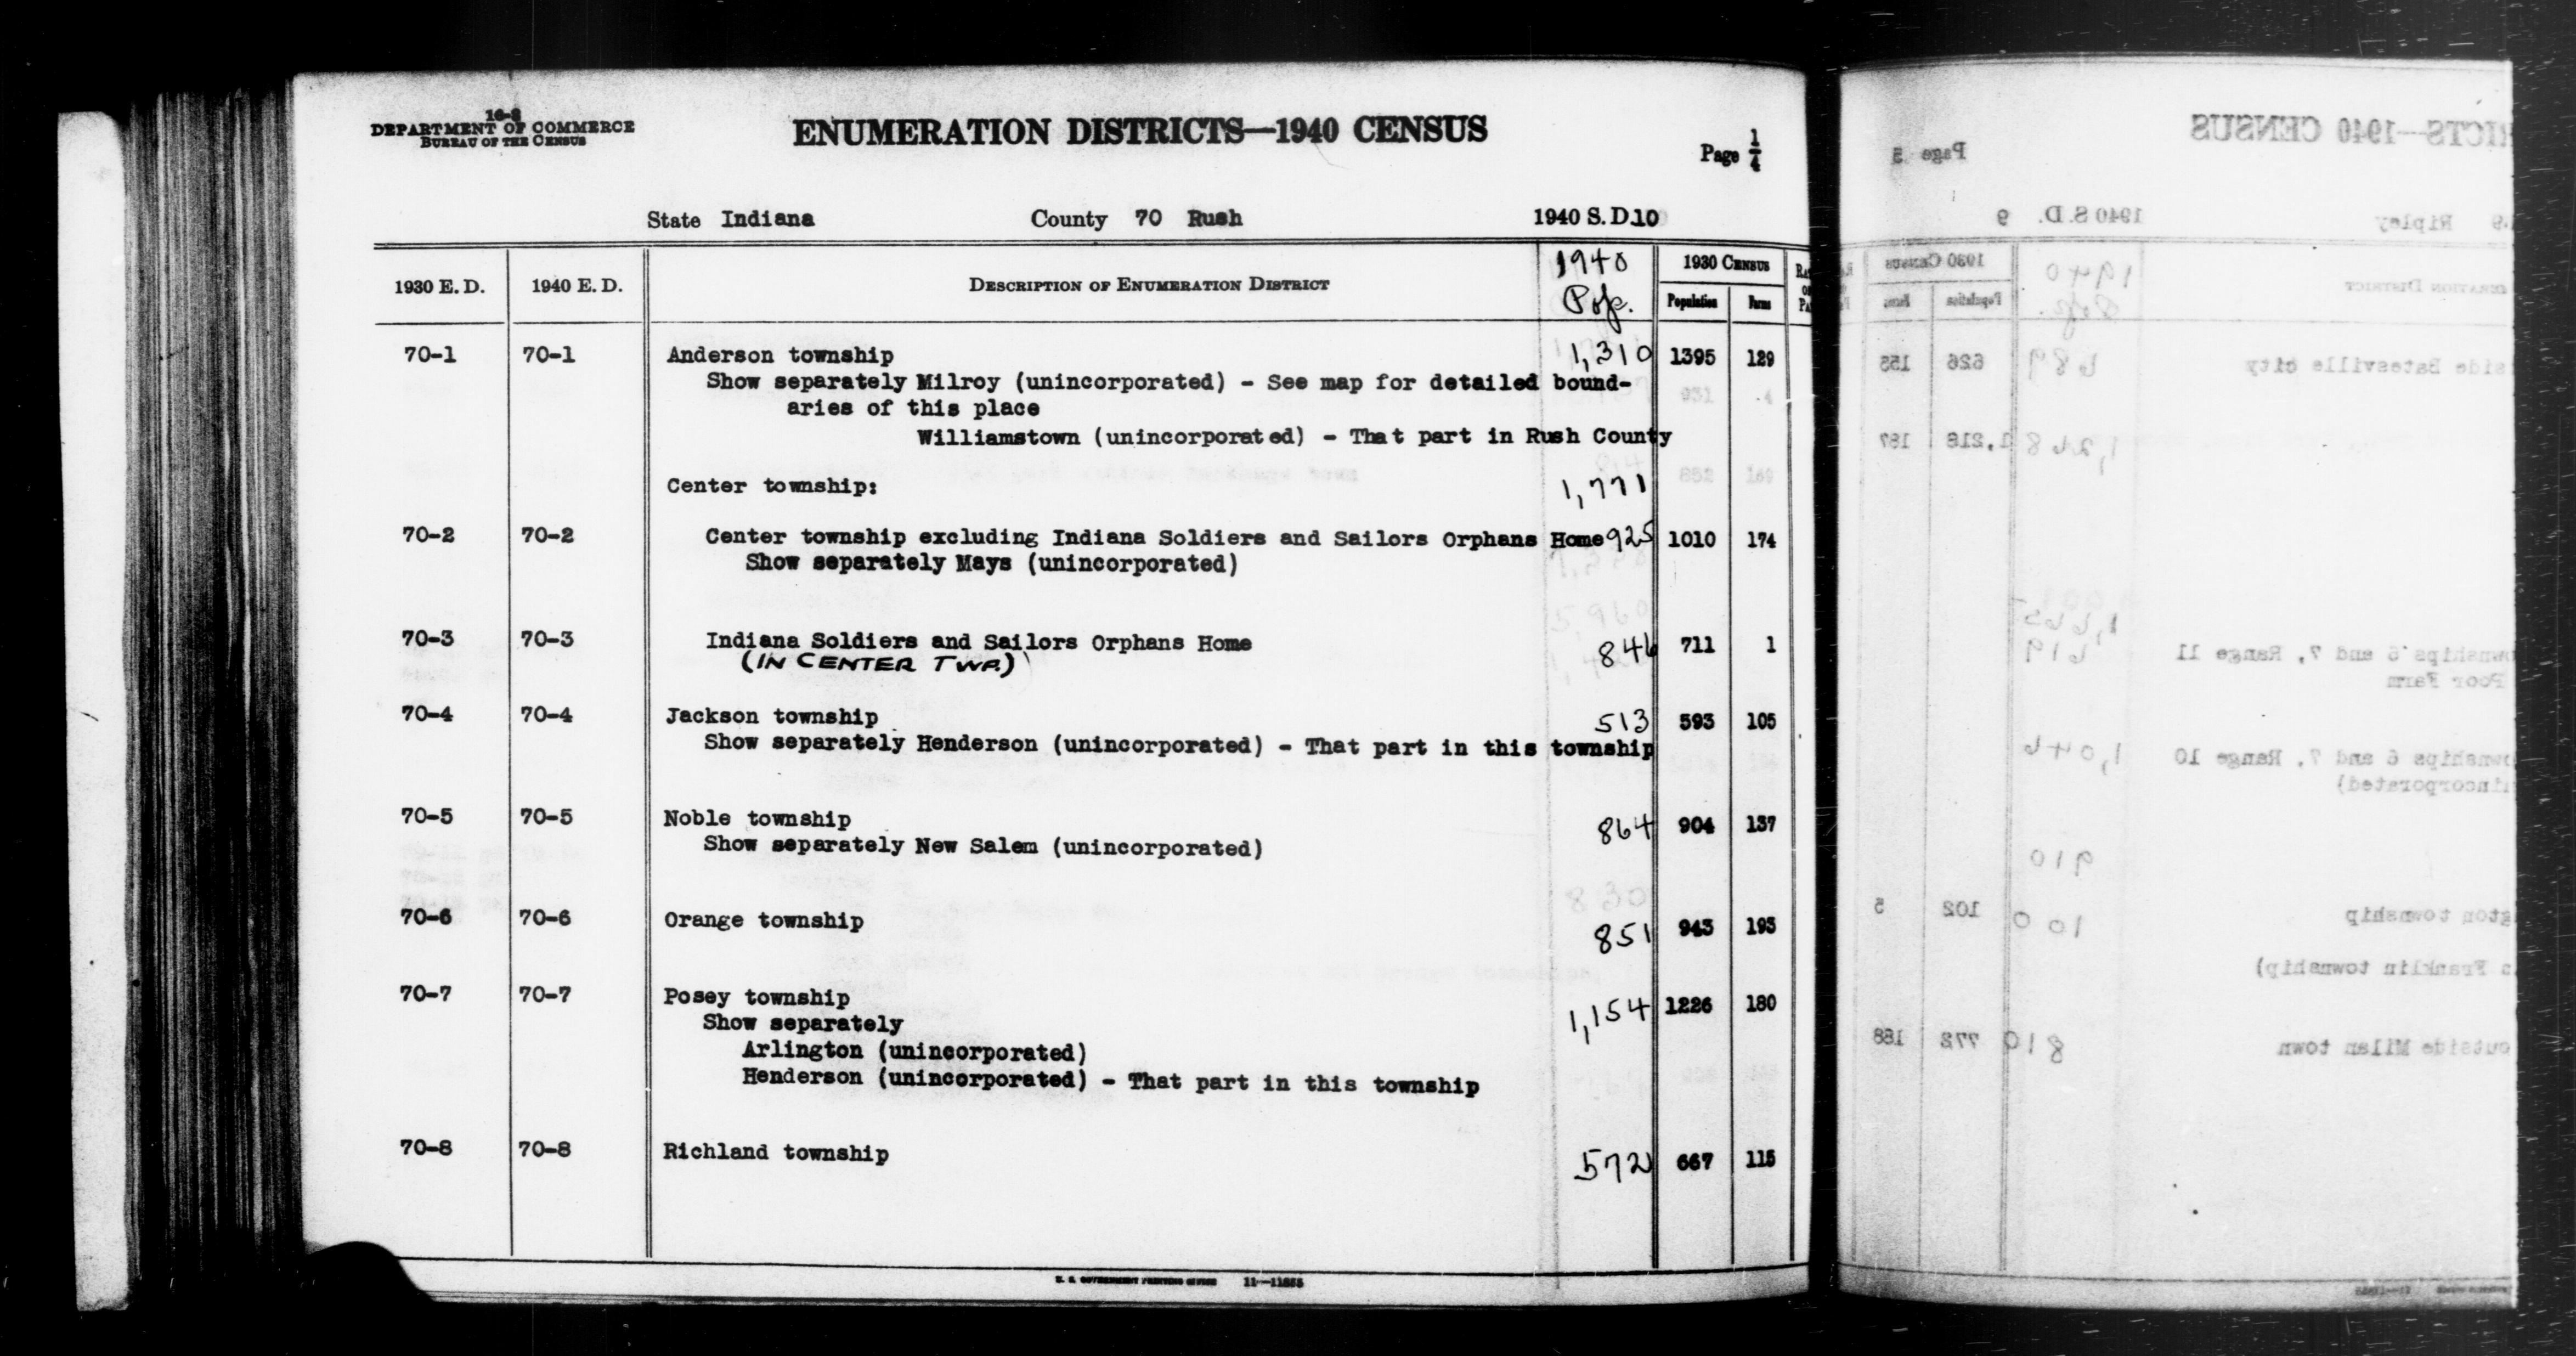 1940 Census Enumeration District Descriptions - Indiana - Rush County - ED 70-1, ED 70-2, ED 70-3, ED 70-4, ED 70-5, ED 70-6, ED 70-7, ED 70-8